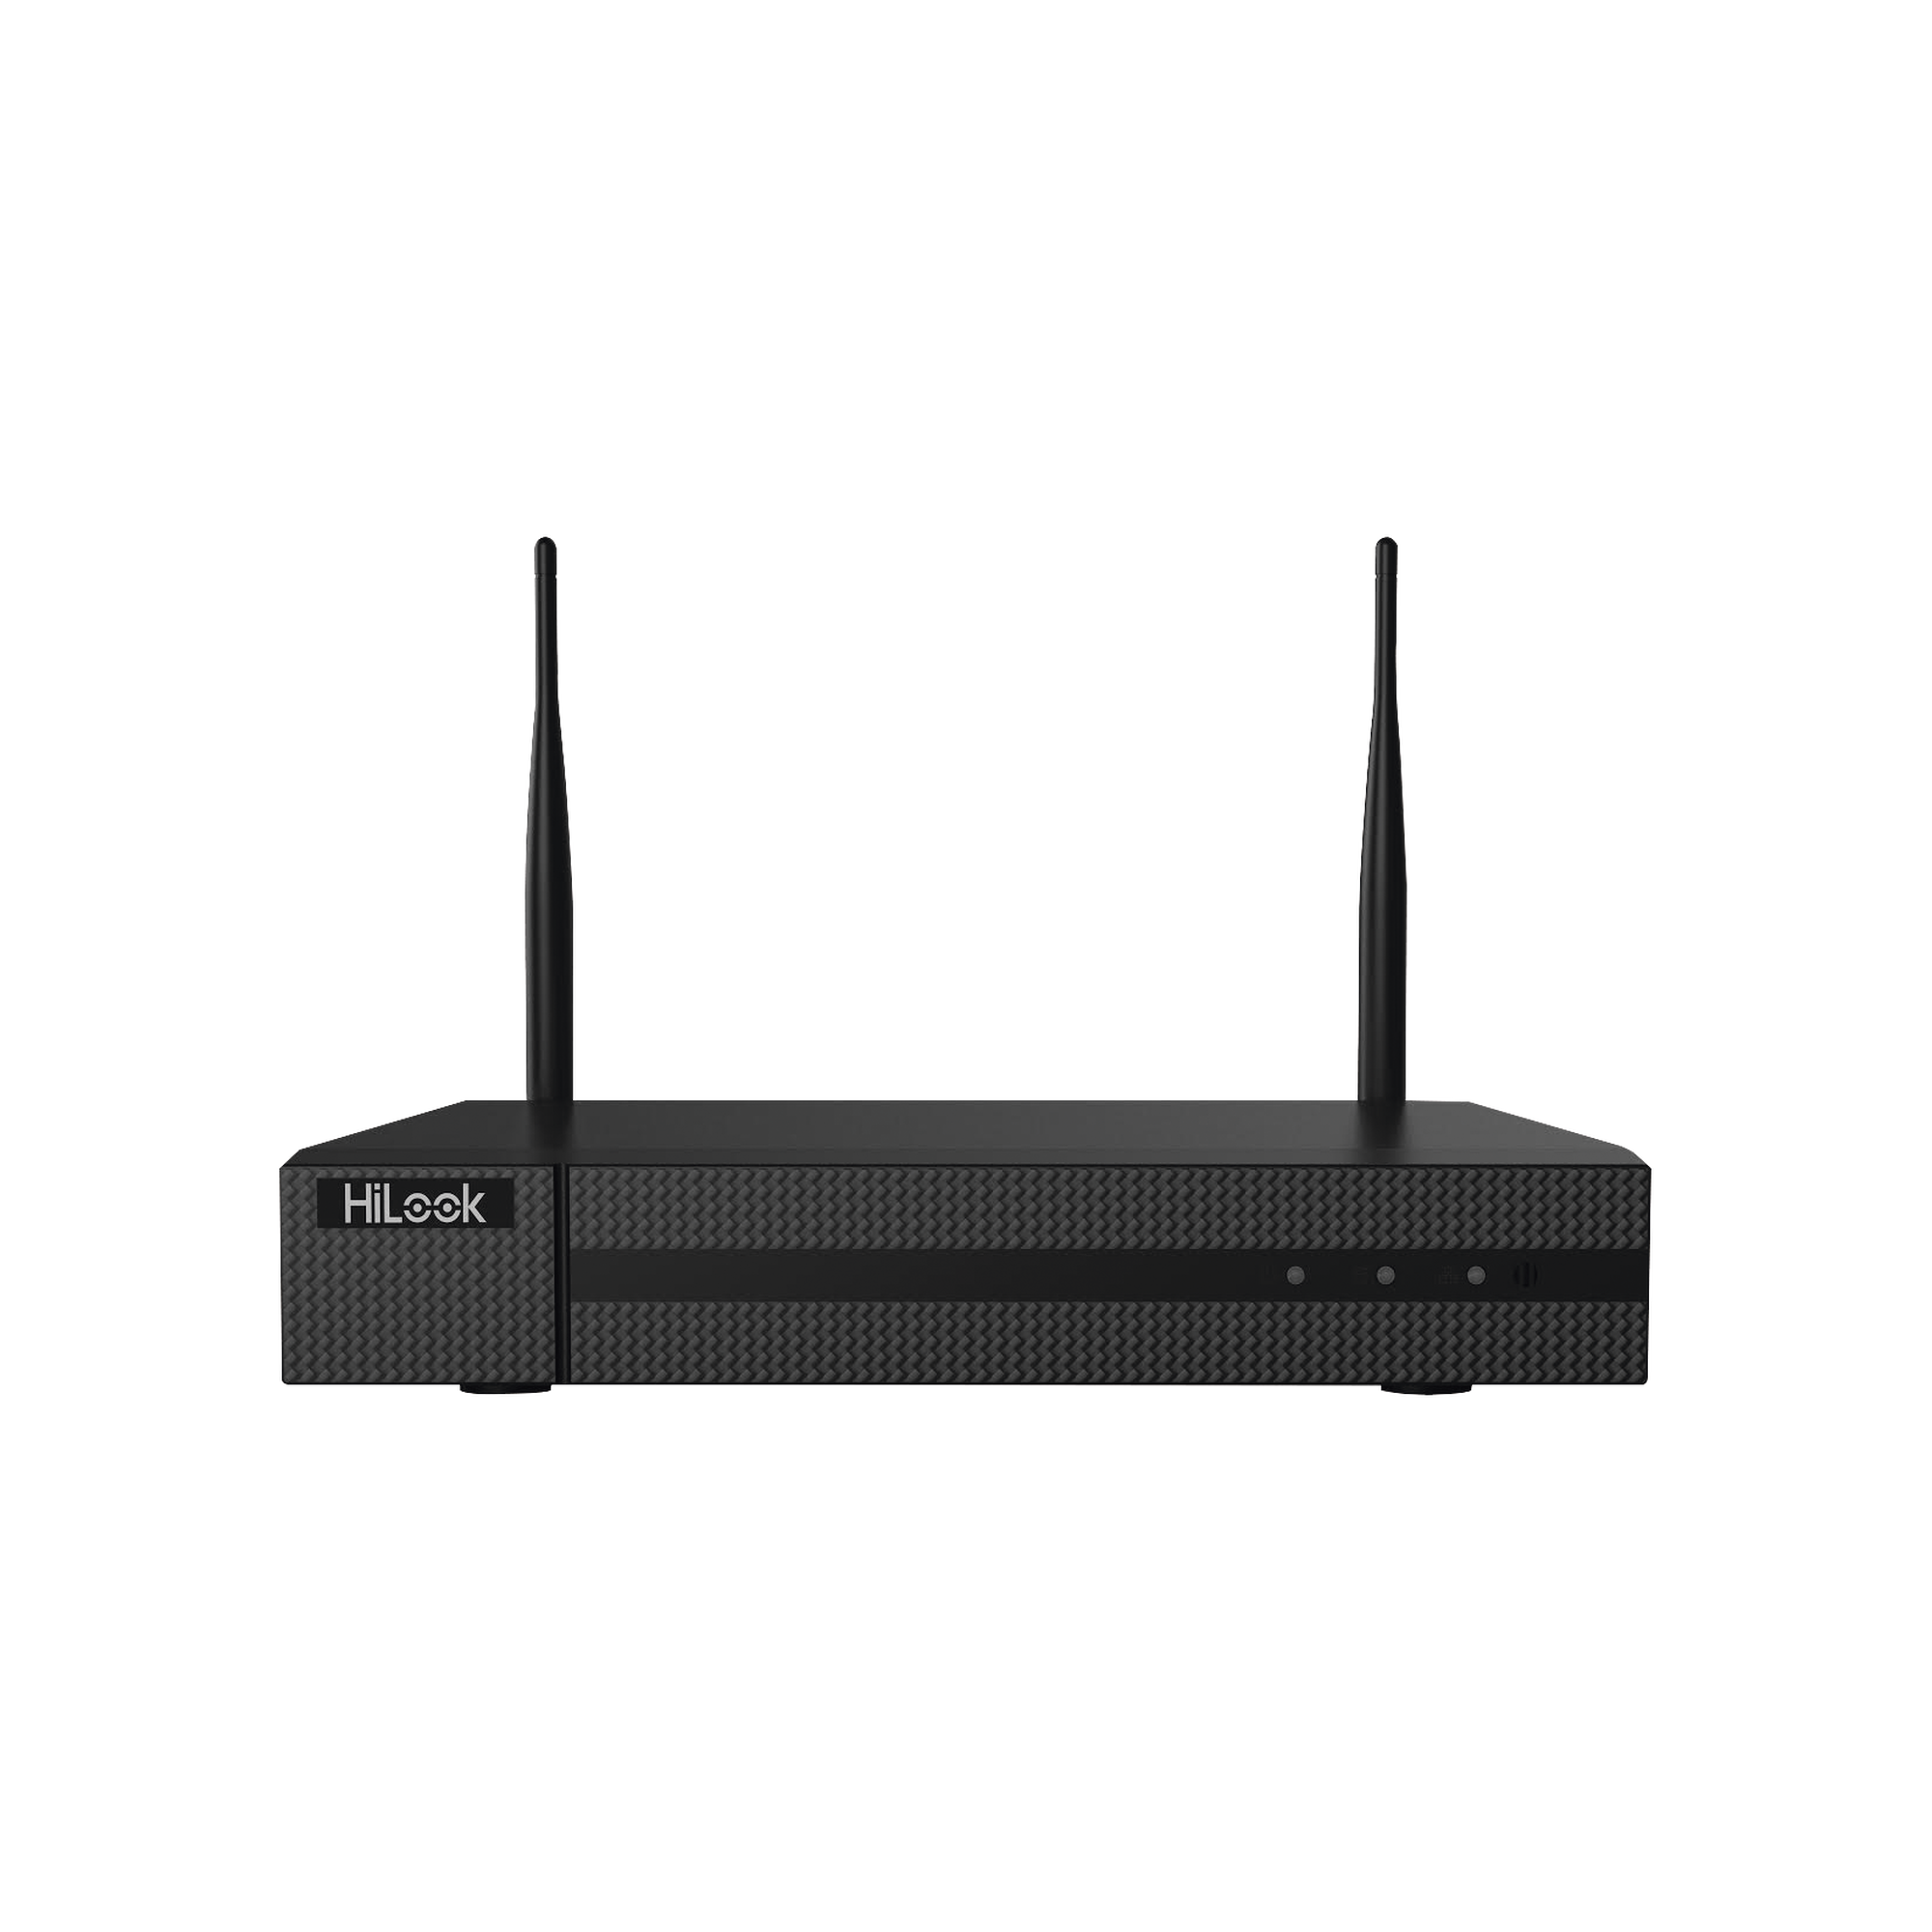 NVR 4 Megapixel / 4 canales IP / 1 Bahía de Disco Duro / 2 Antenas WIFI / Salida de Vídeo Full HD